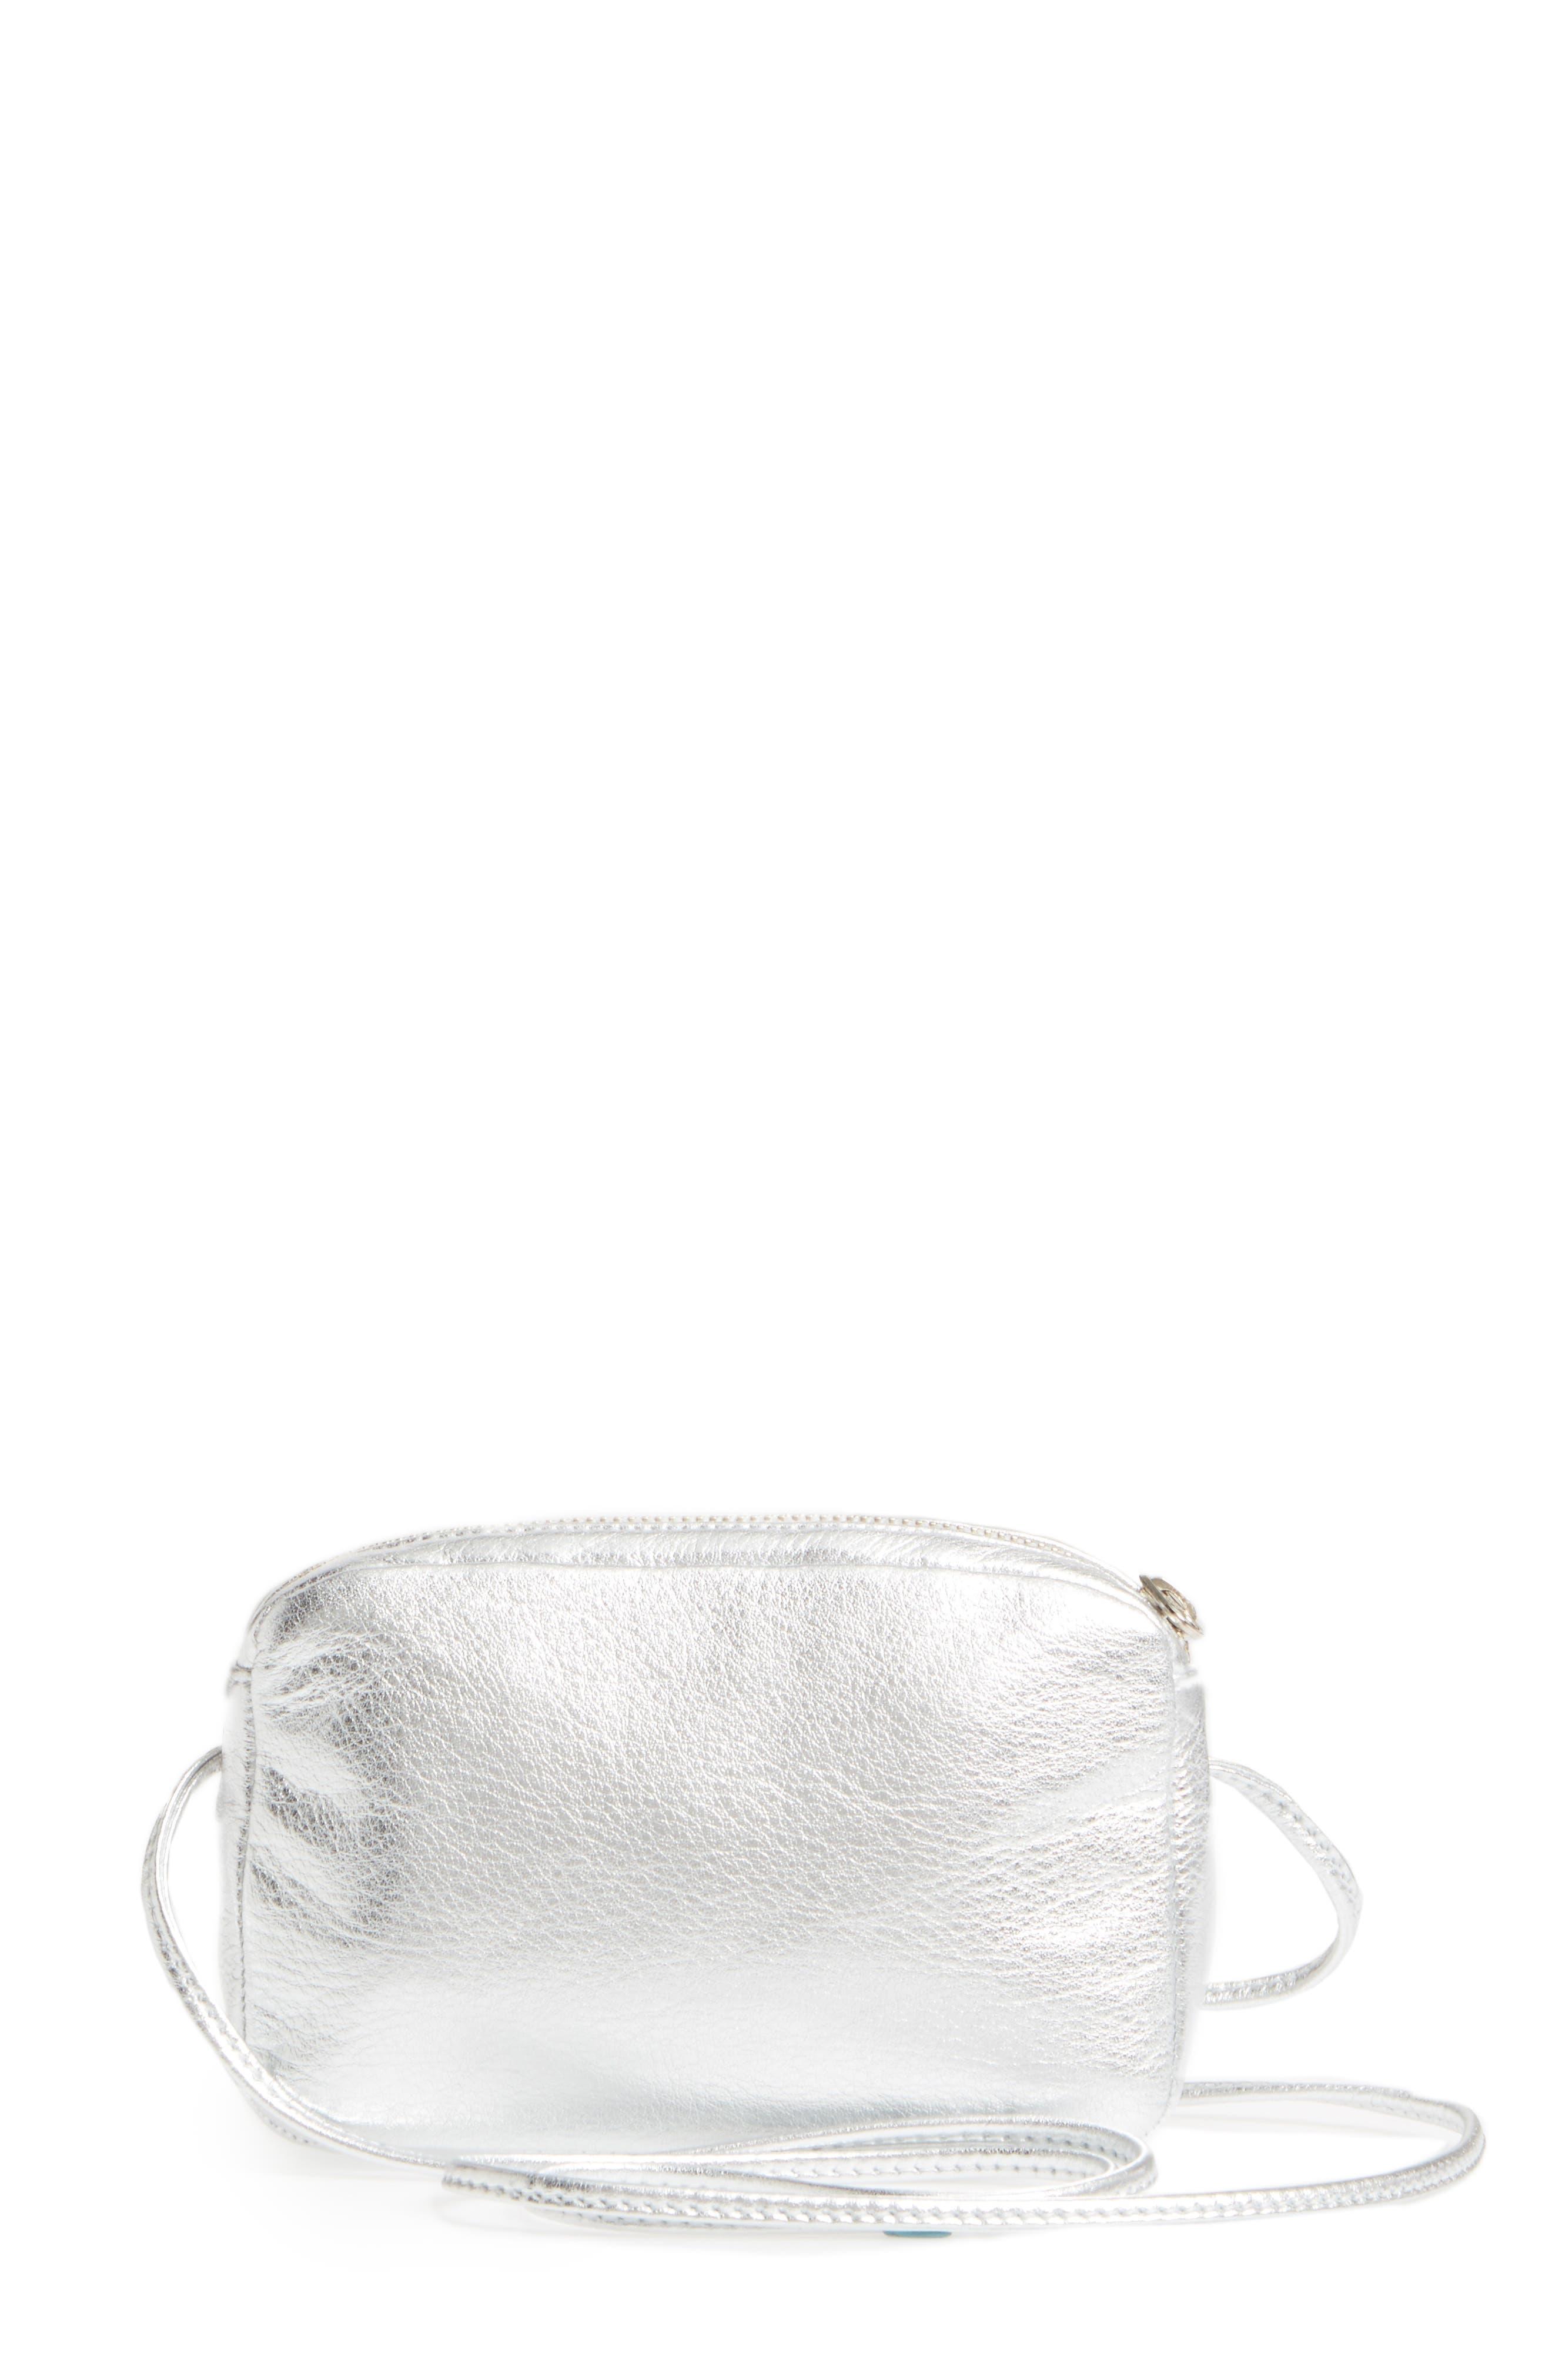 Alternate Image 1 Selected - Baggu 'Mini' Pebbled Leather Crossbody